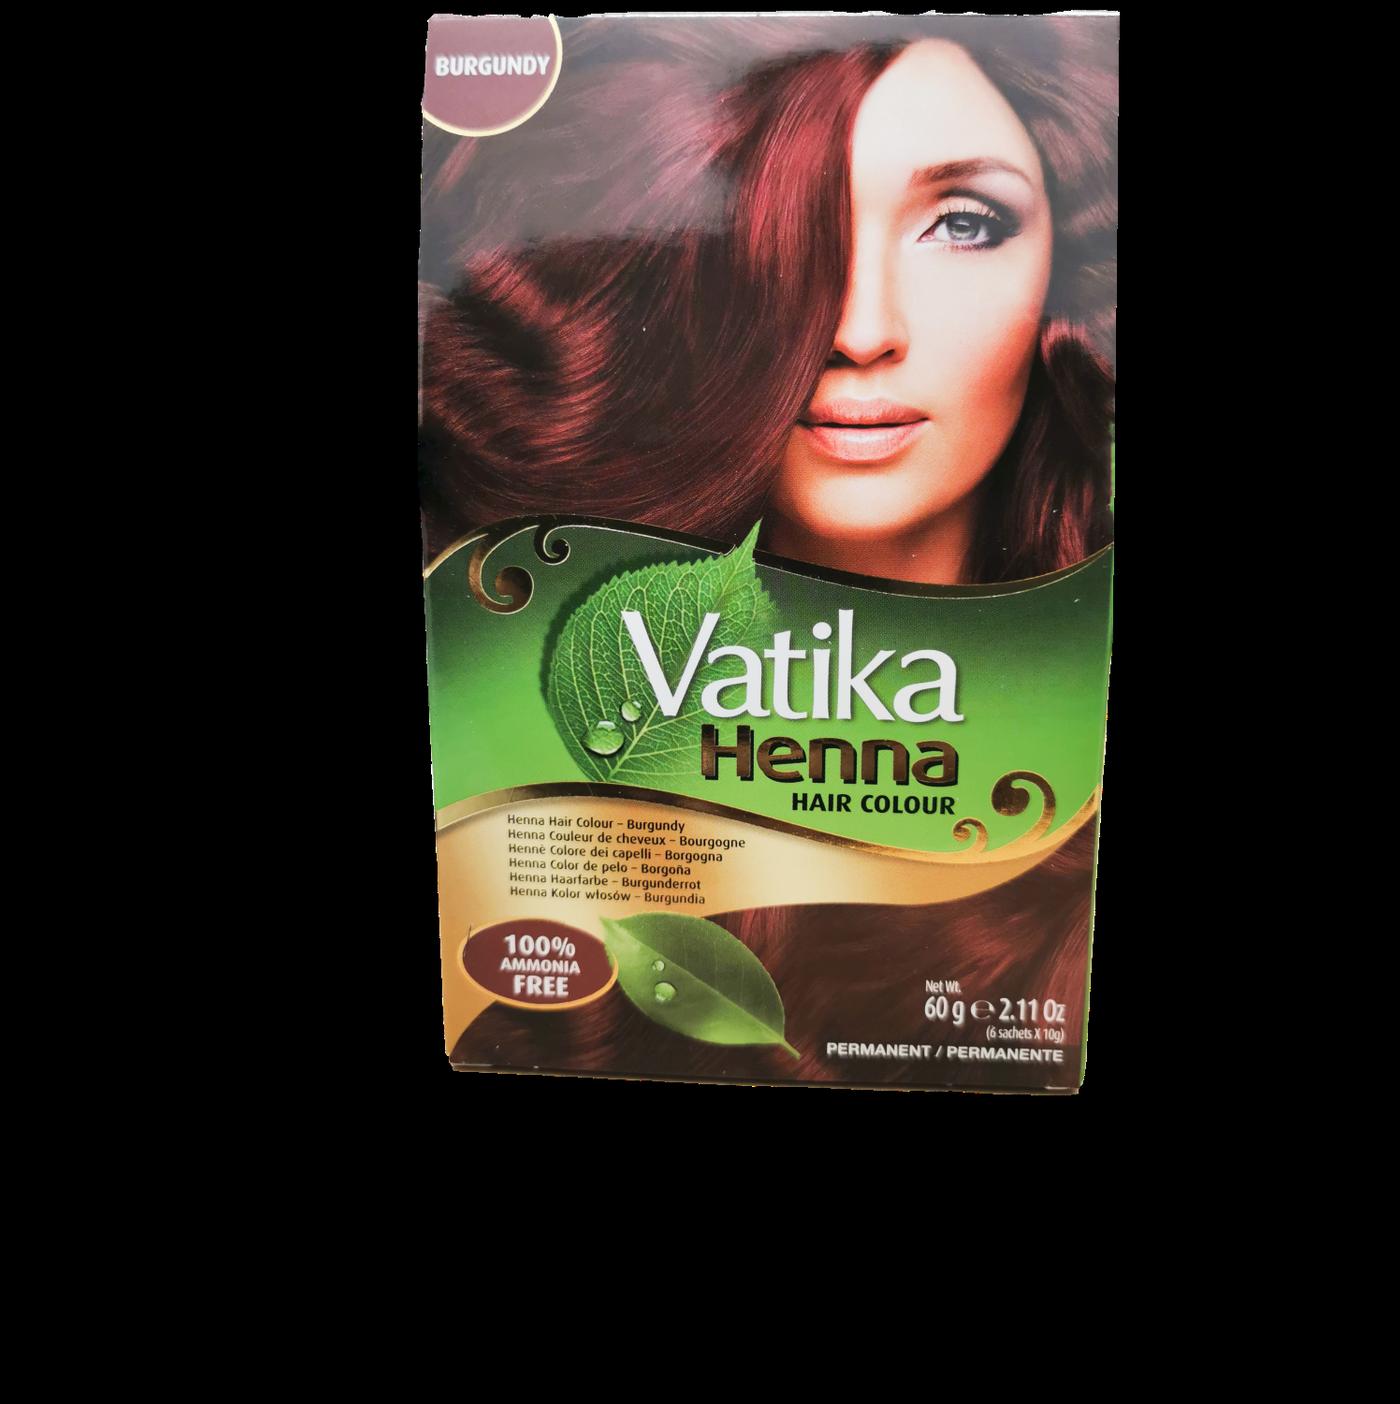 Vatika Henna Hair Colour (Burgundy)